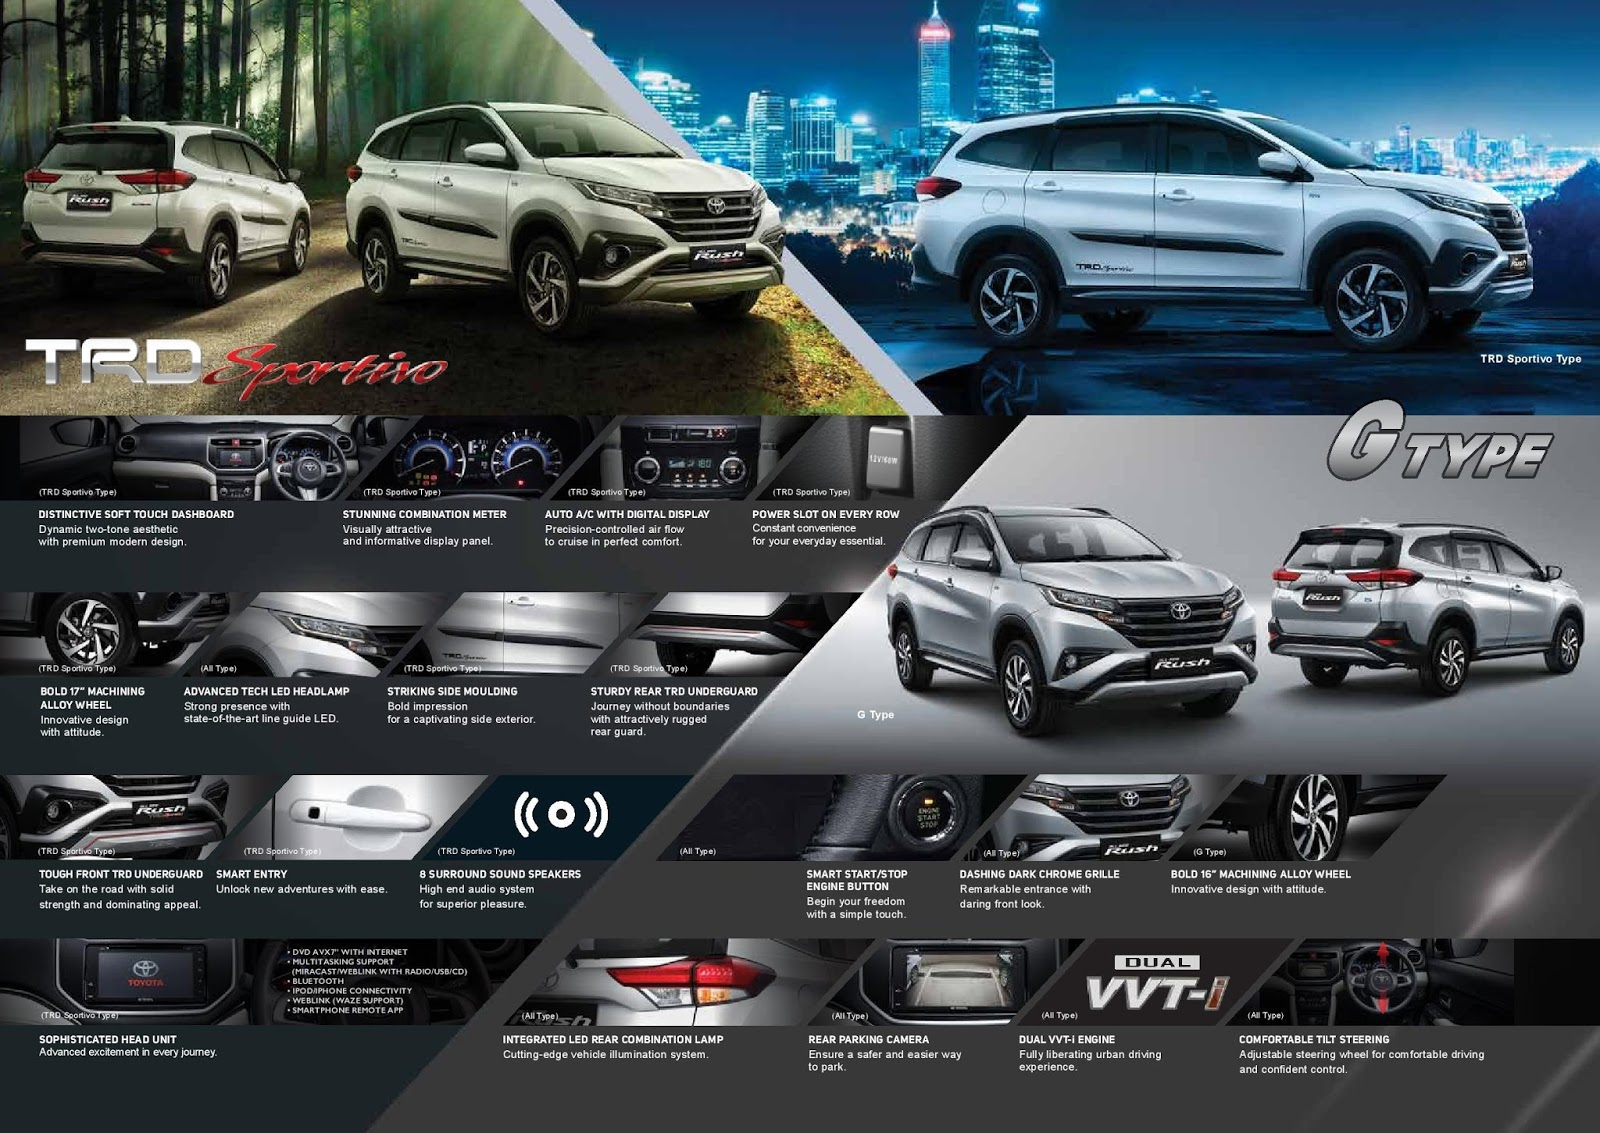 spesifikasi grand new avanza 2018 all camry pantip brosur toyota rush pekanbaru